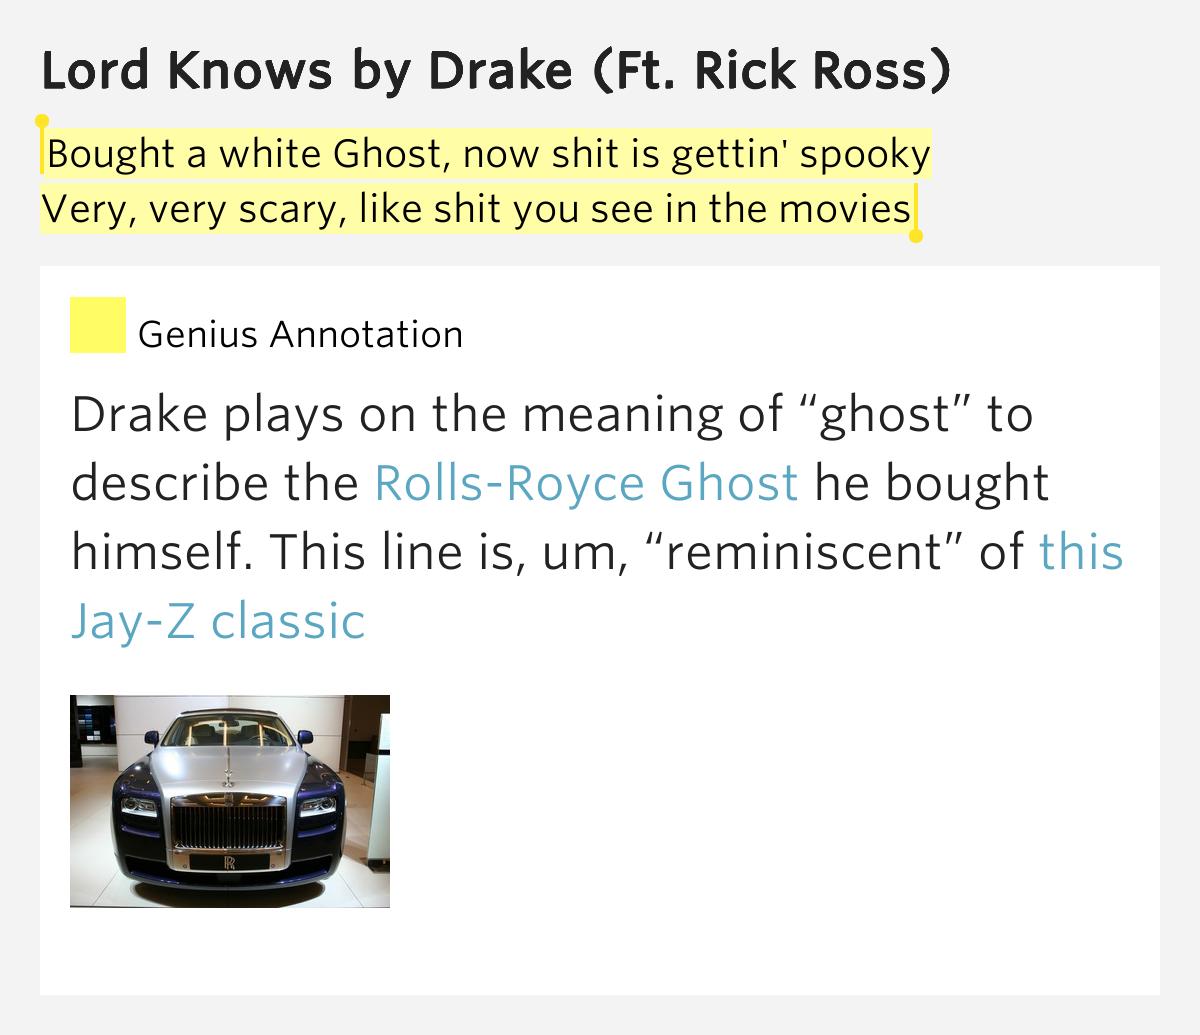 DRAKE FEAT. RICK ROSS - LORD KNOWS LYRICS